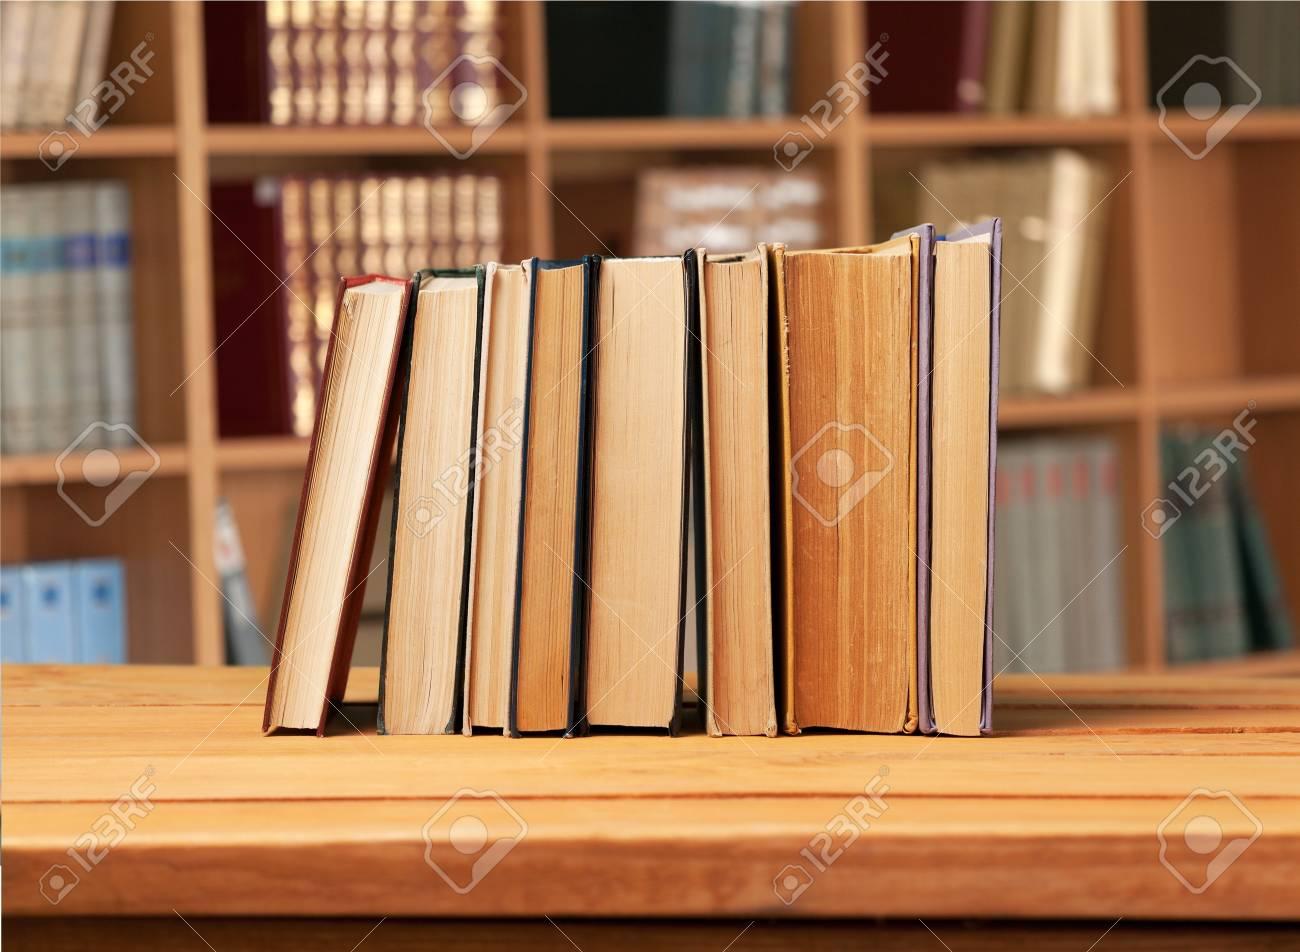 vintage books on wooden